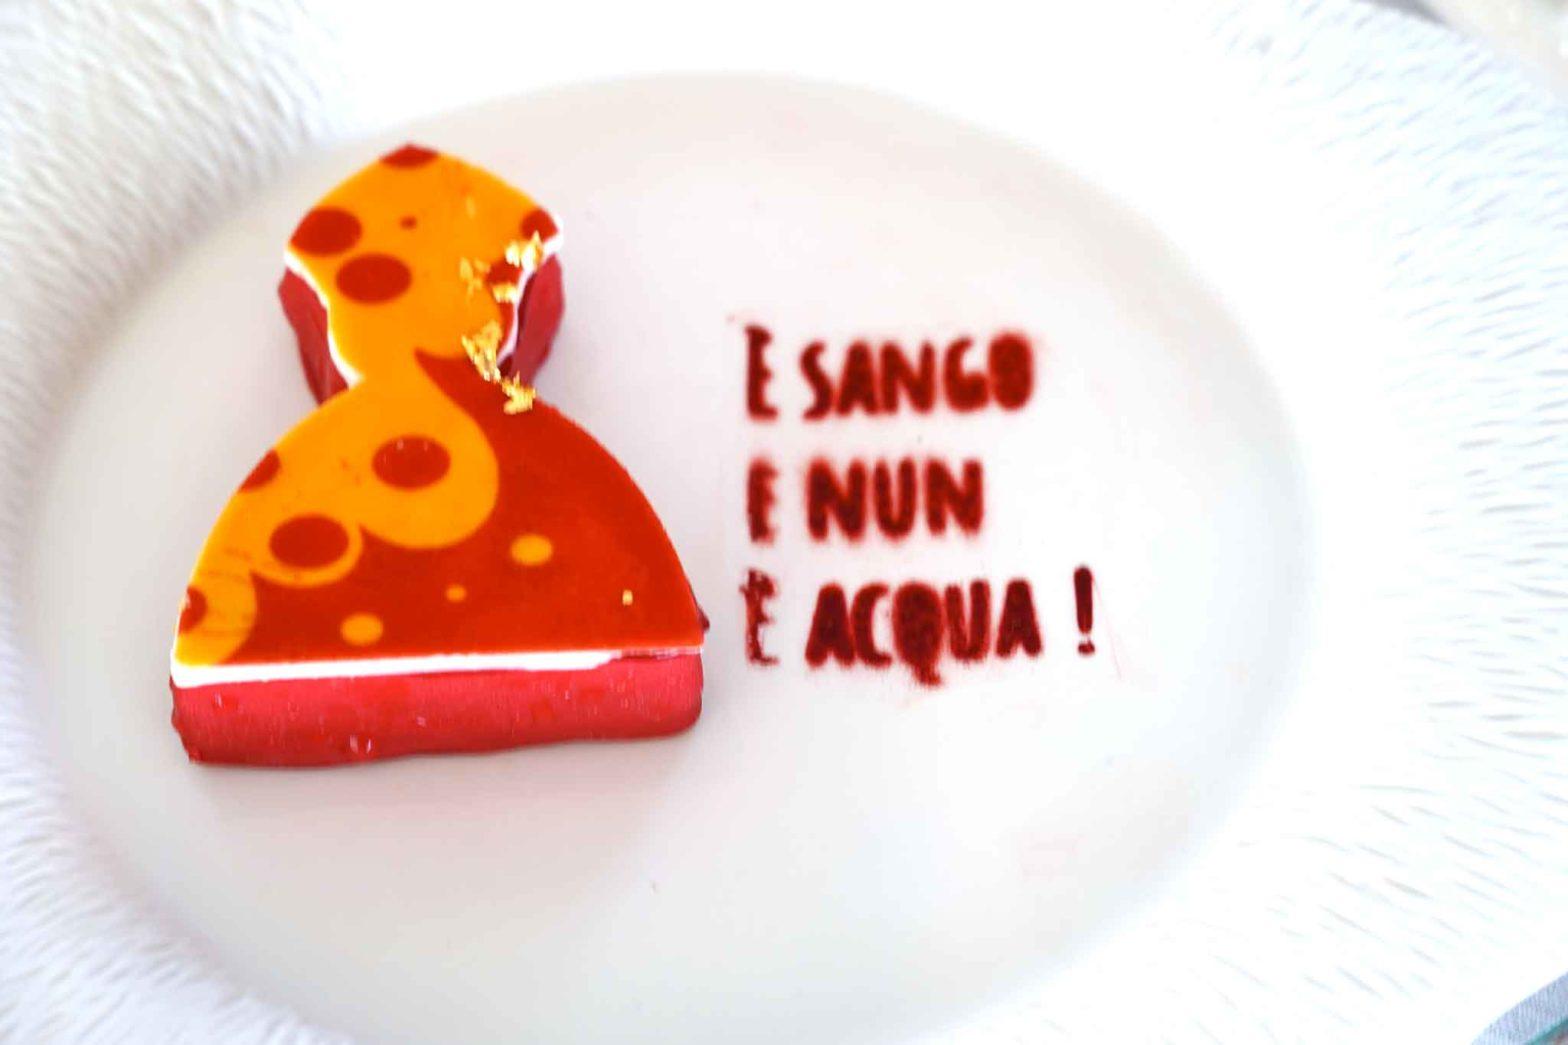 dolce San Gennaro vincitore contest